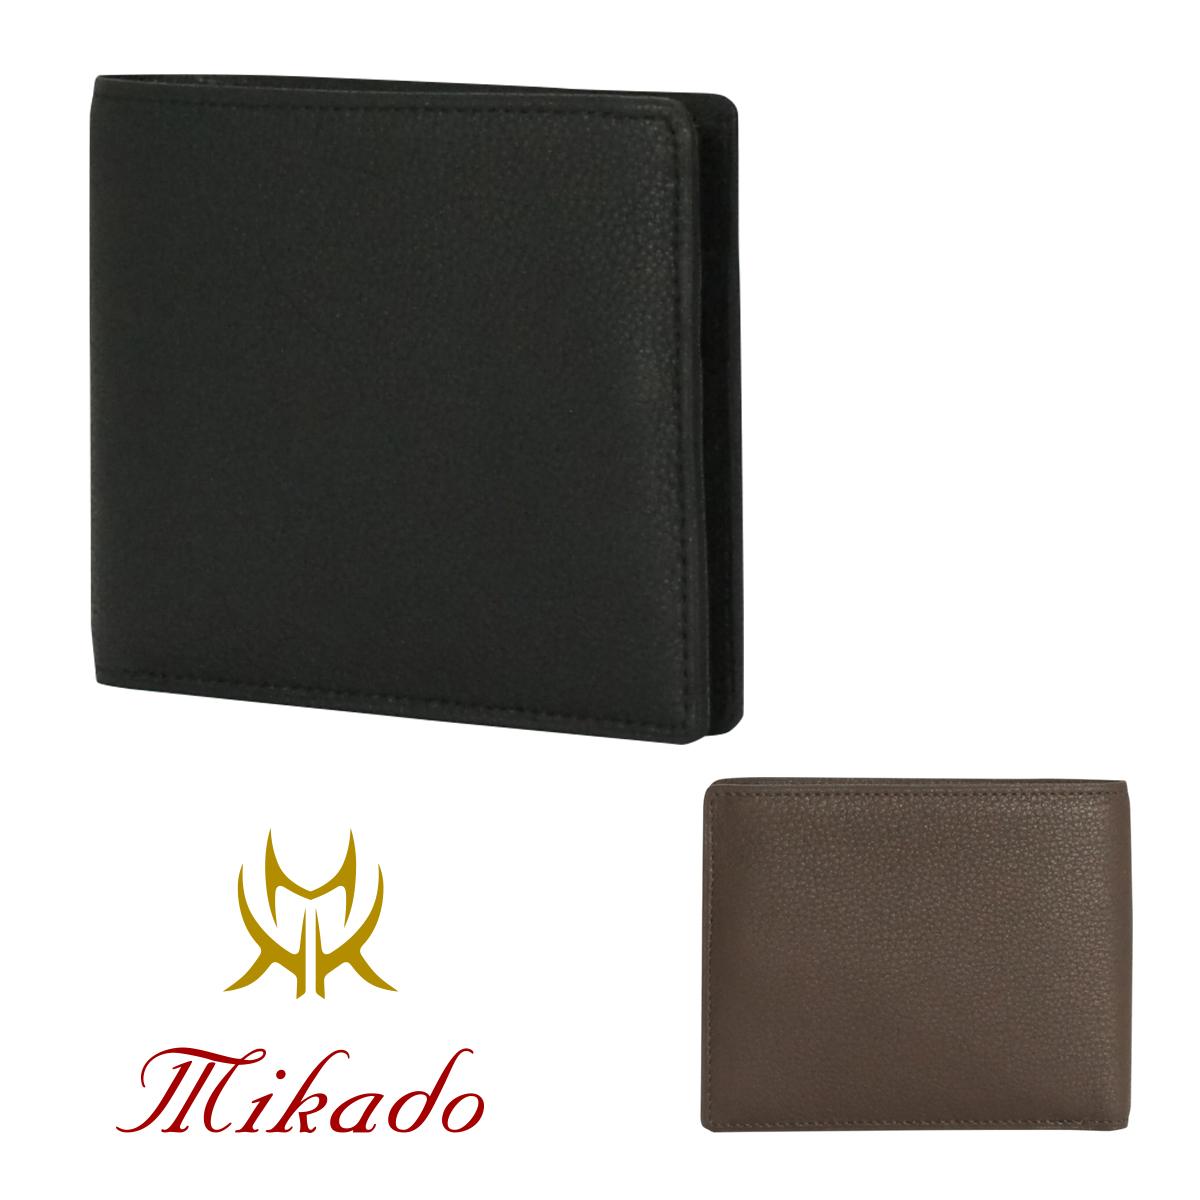 Mikado 二つ折り財布 小銭入れなし メンズ コンビヌメ 日本製 318013 ミカド 牛革 シボ レザー [PO5][bef][即日発送]